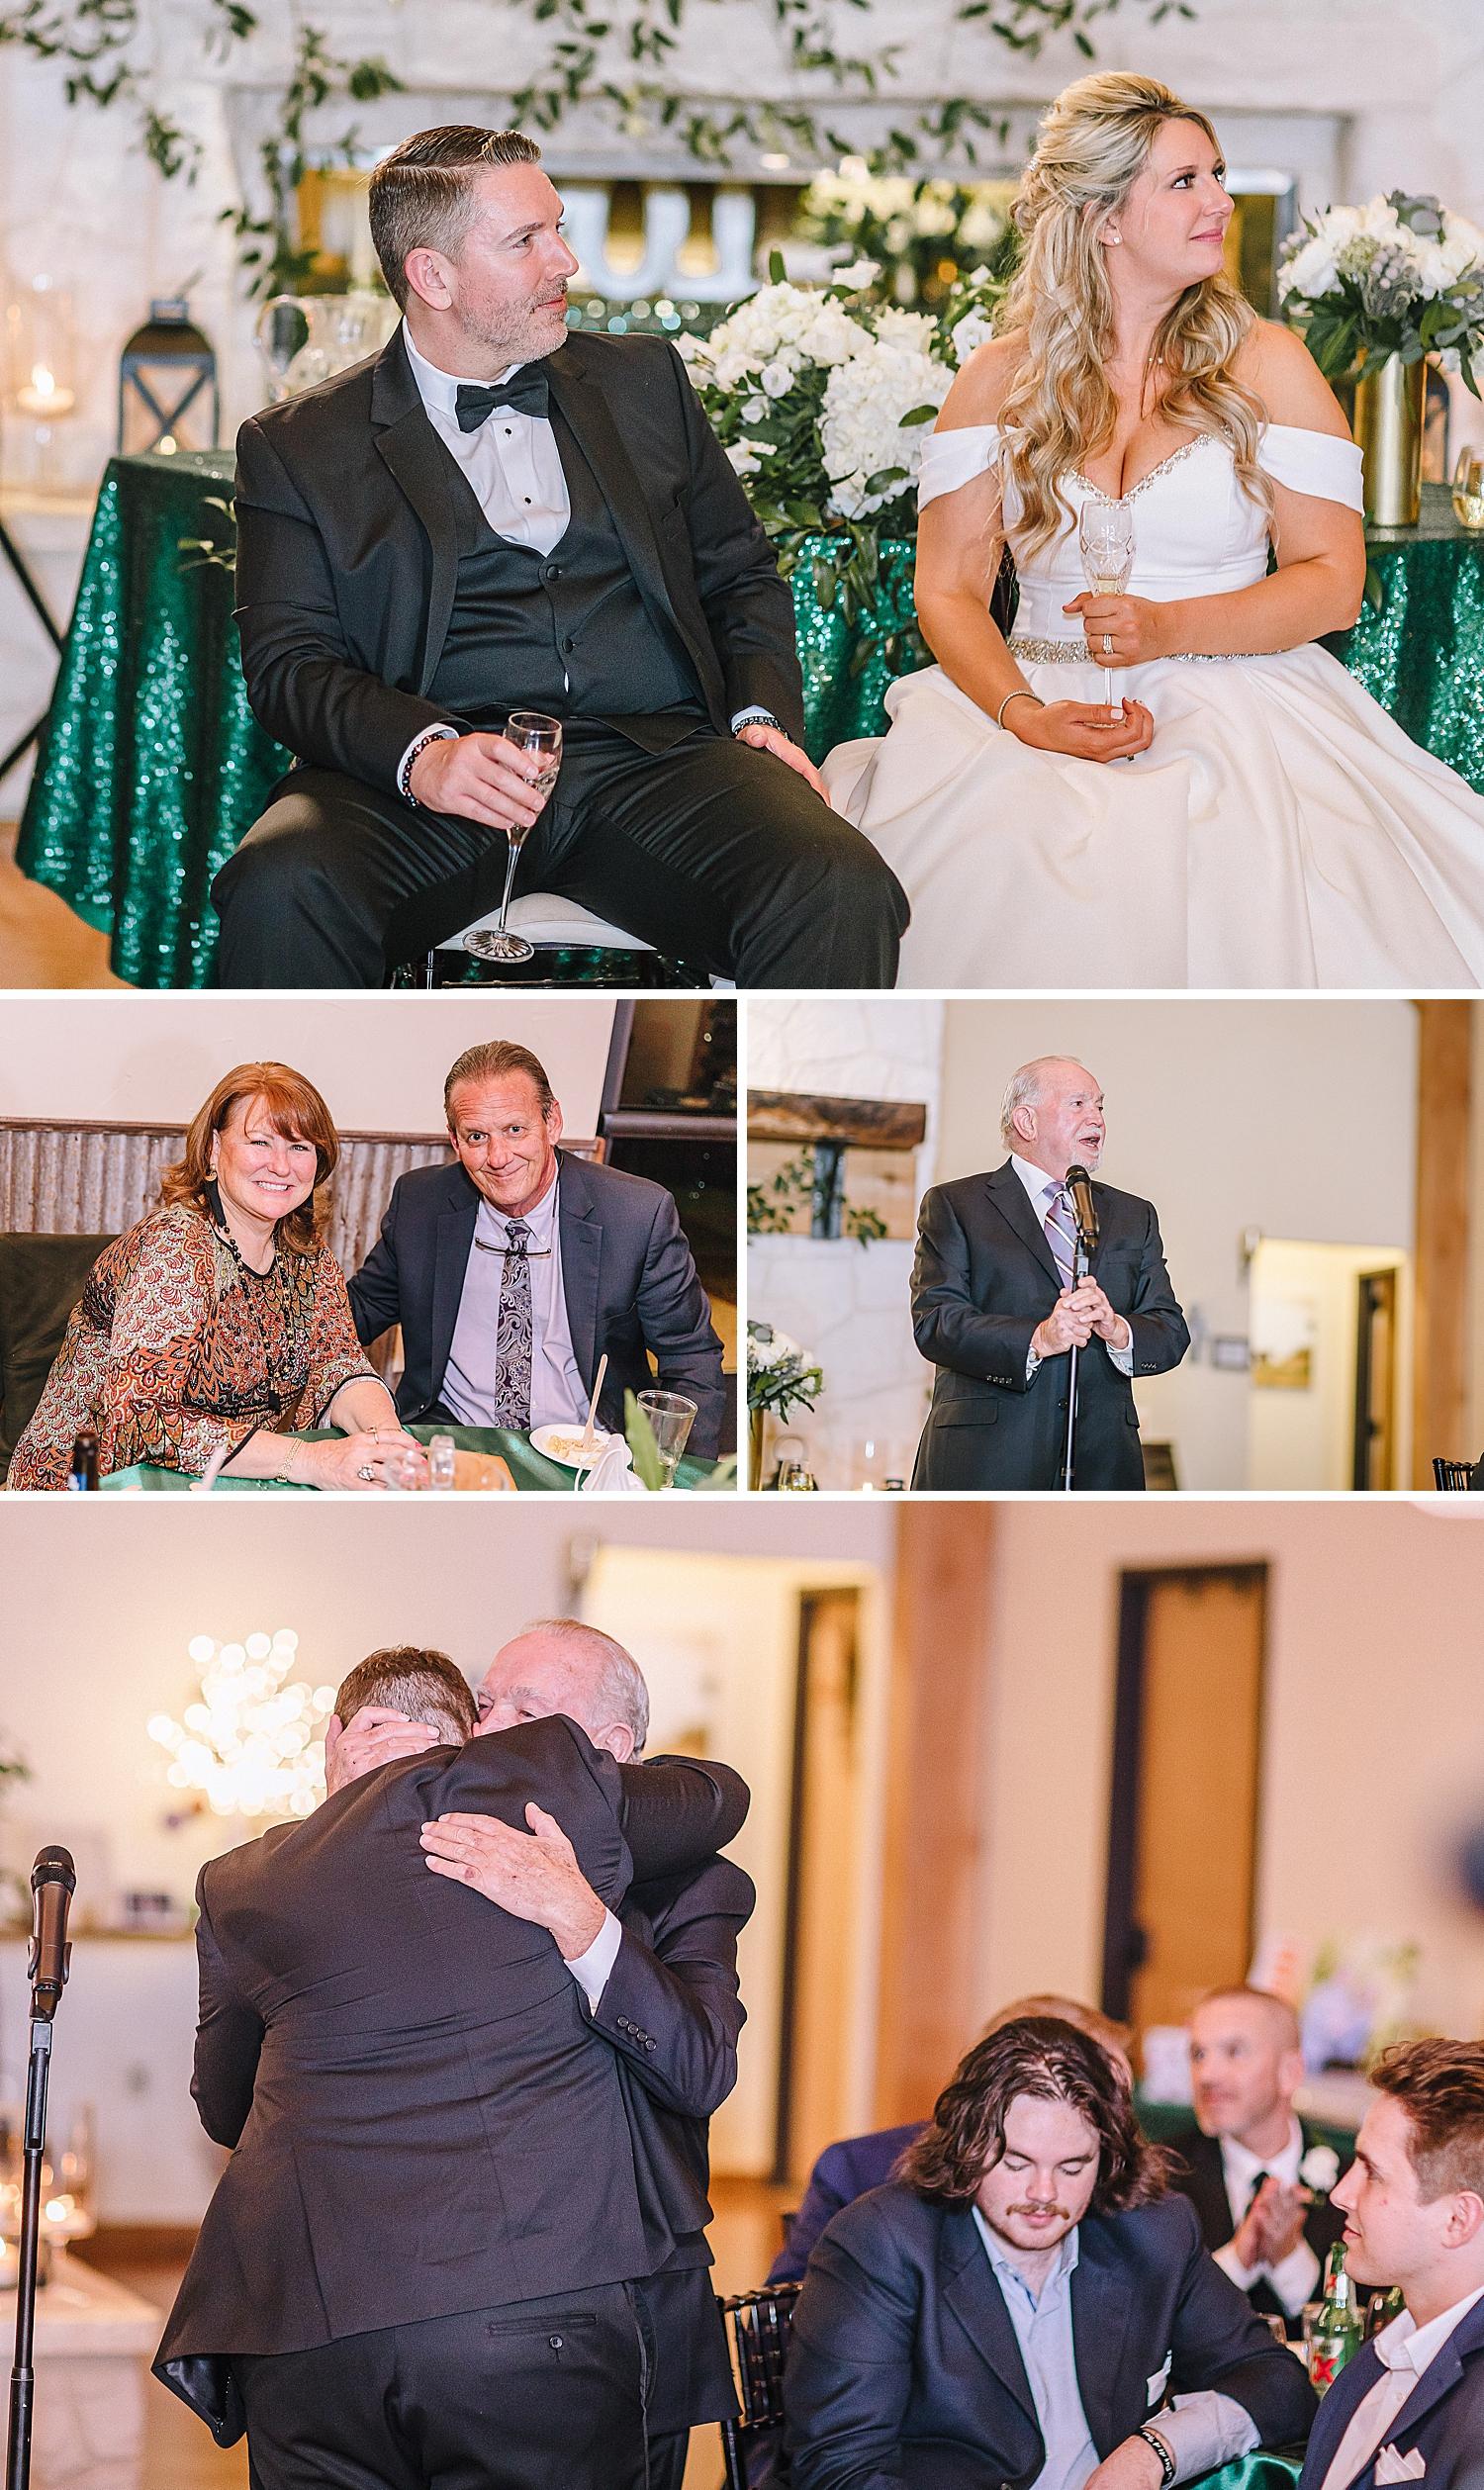 Magnolia-Halle-Wedding-San-Antonio-Texas-Bride-Grom_0105.jpg